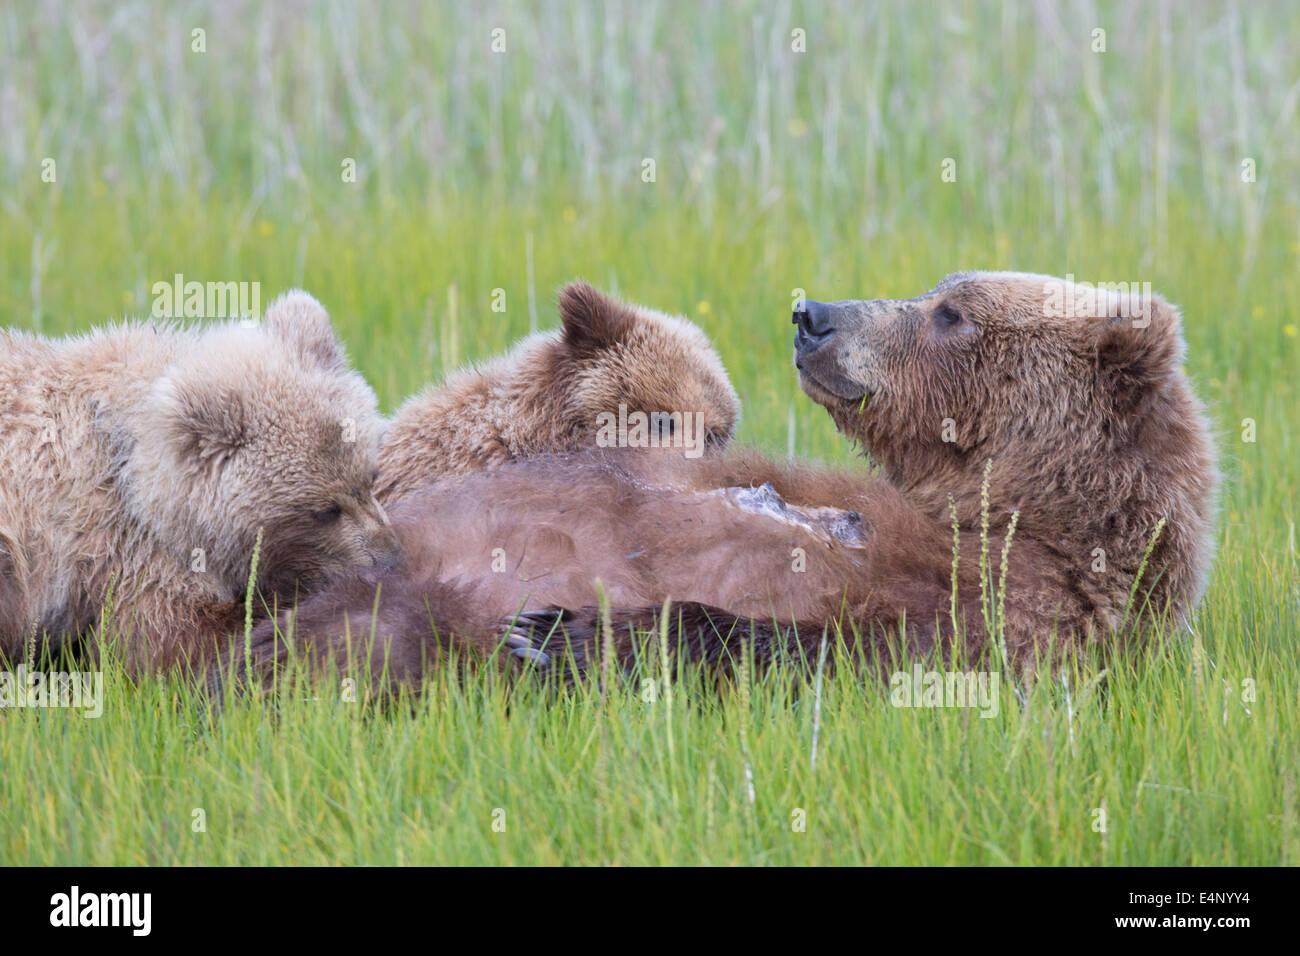 Grizzly Bear Cubs Spanferkel in Wiese Stockfoto